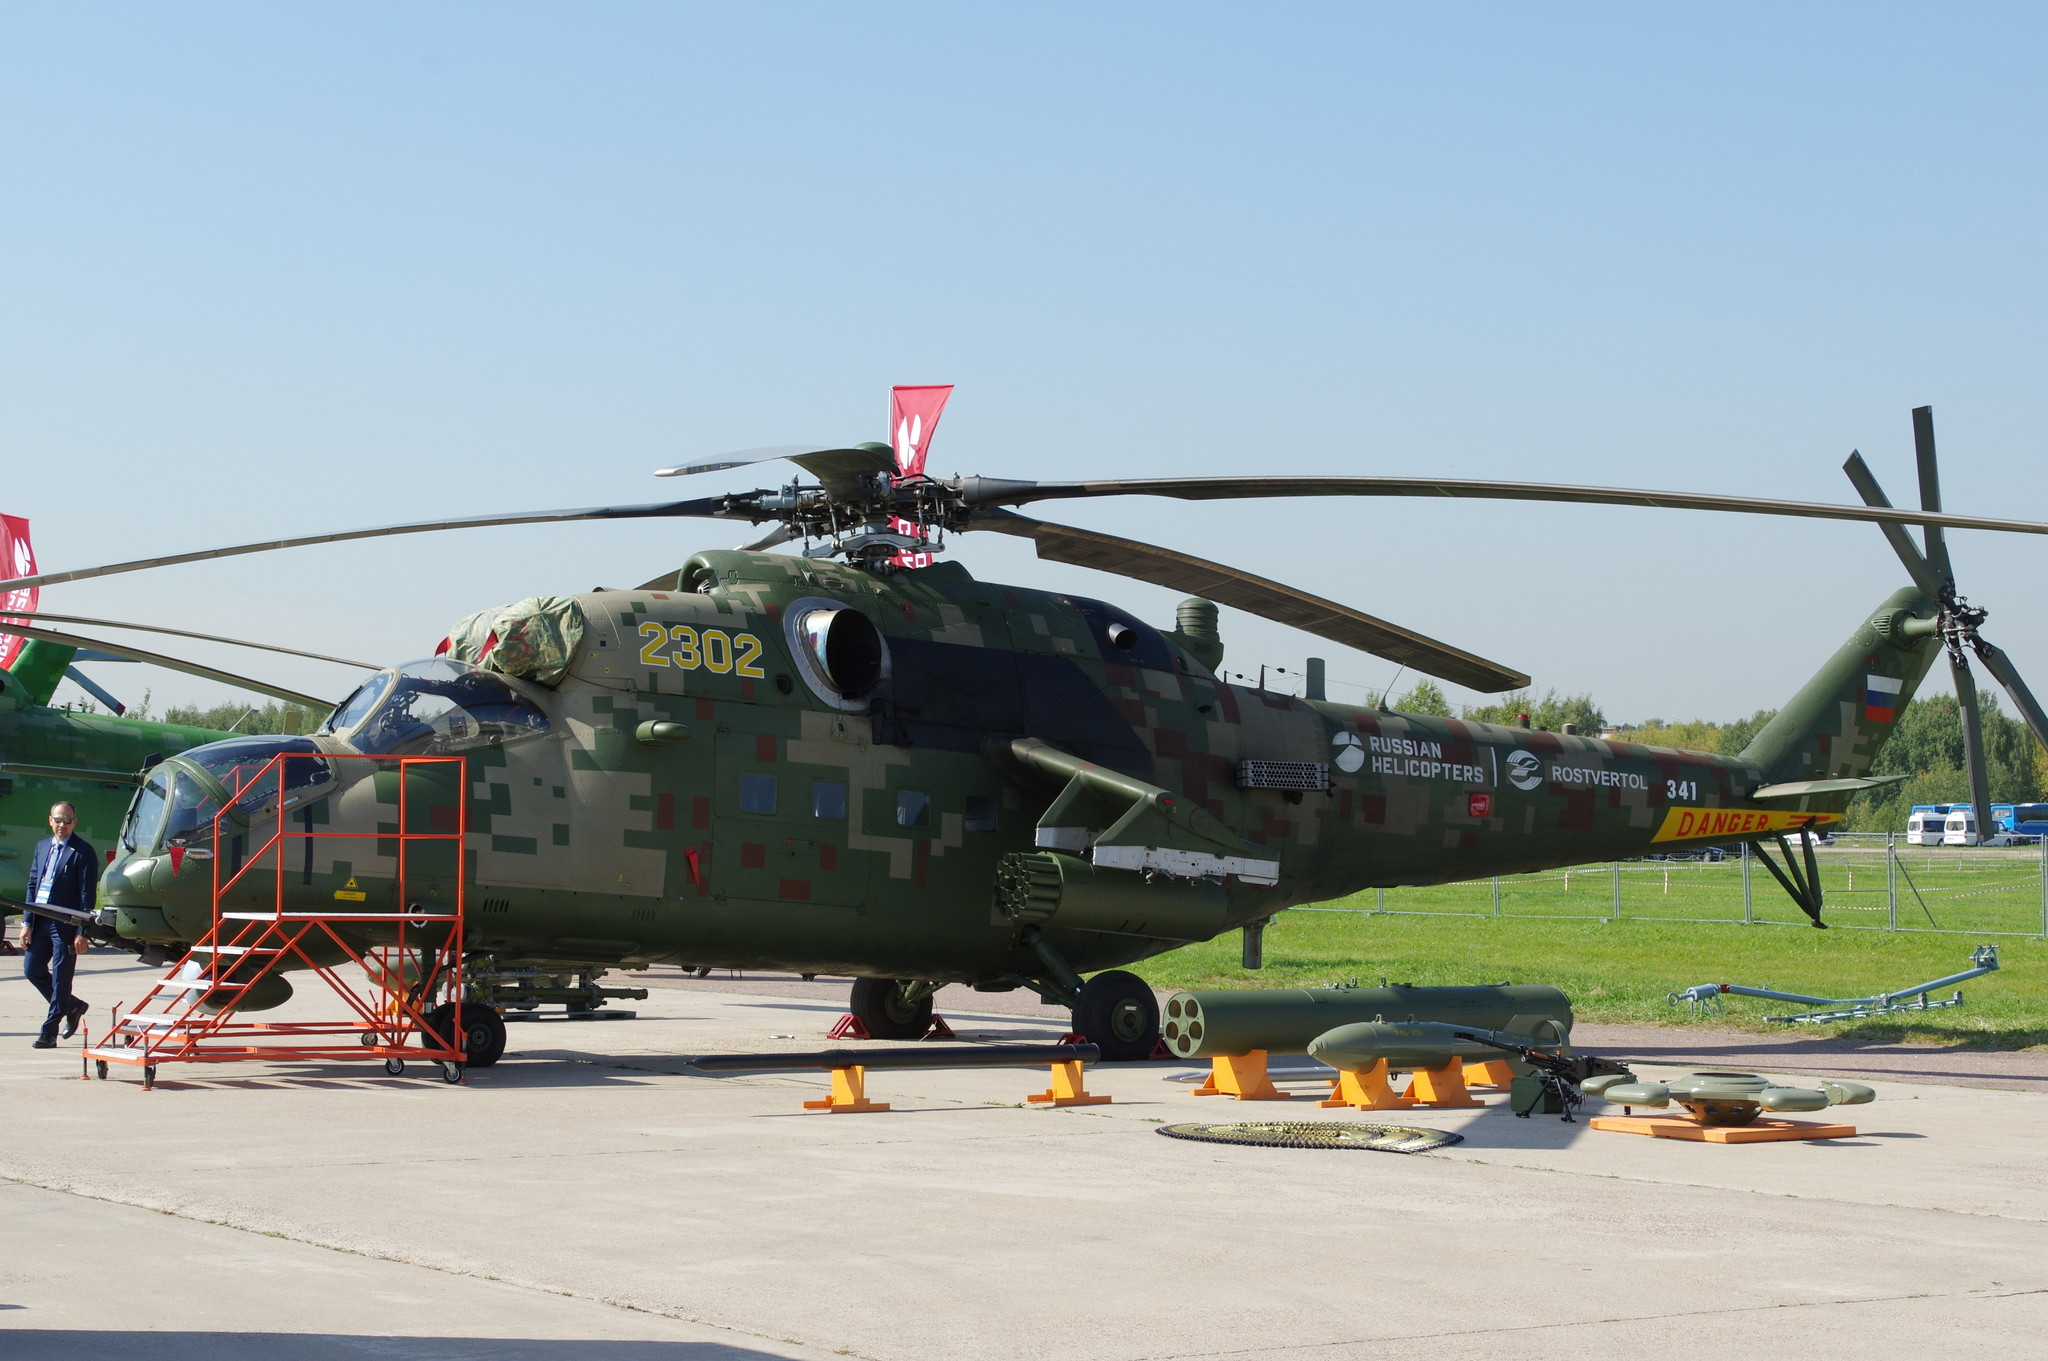 Транспортно-боевой вертолёт Ми-35М - глубокая модернизация вертолёта Ми-24